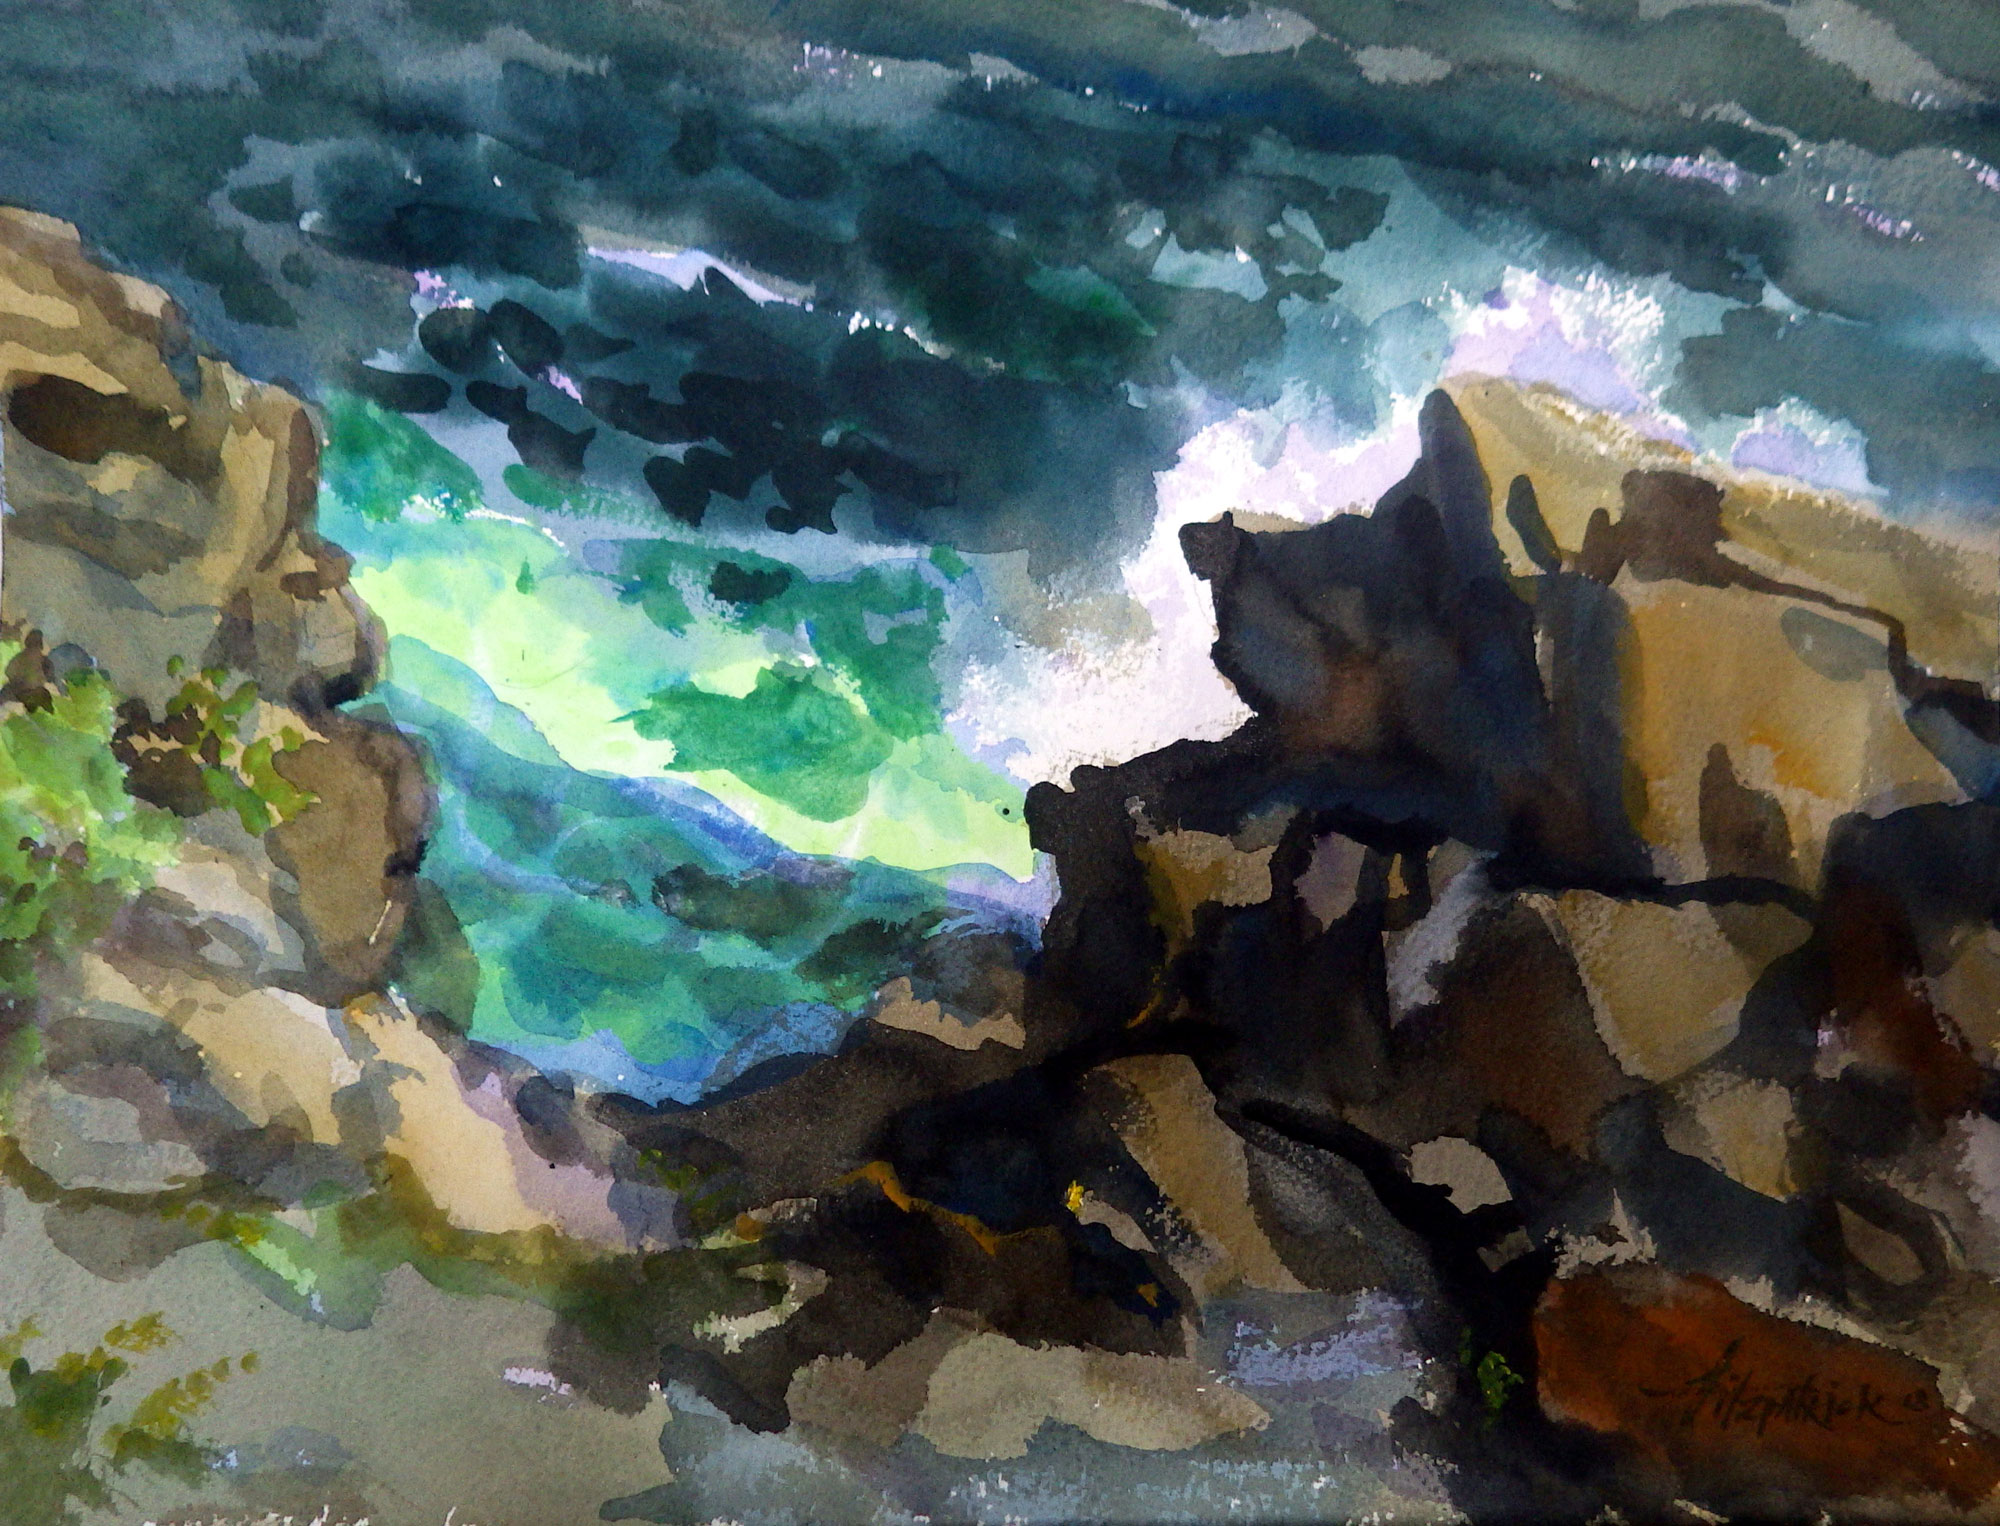 fitzpatrick-maine-surf-watercolor-open-studios.jpg